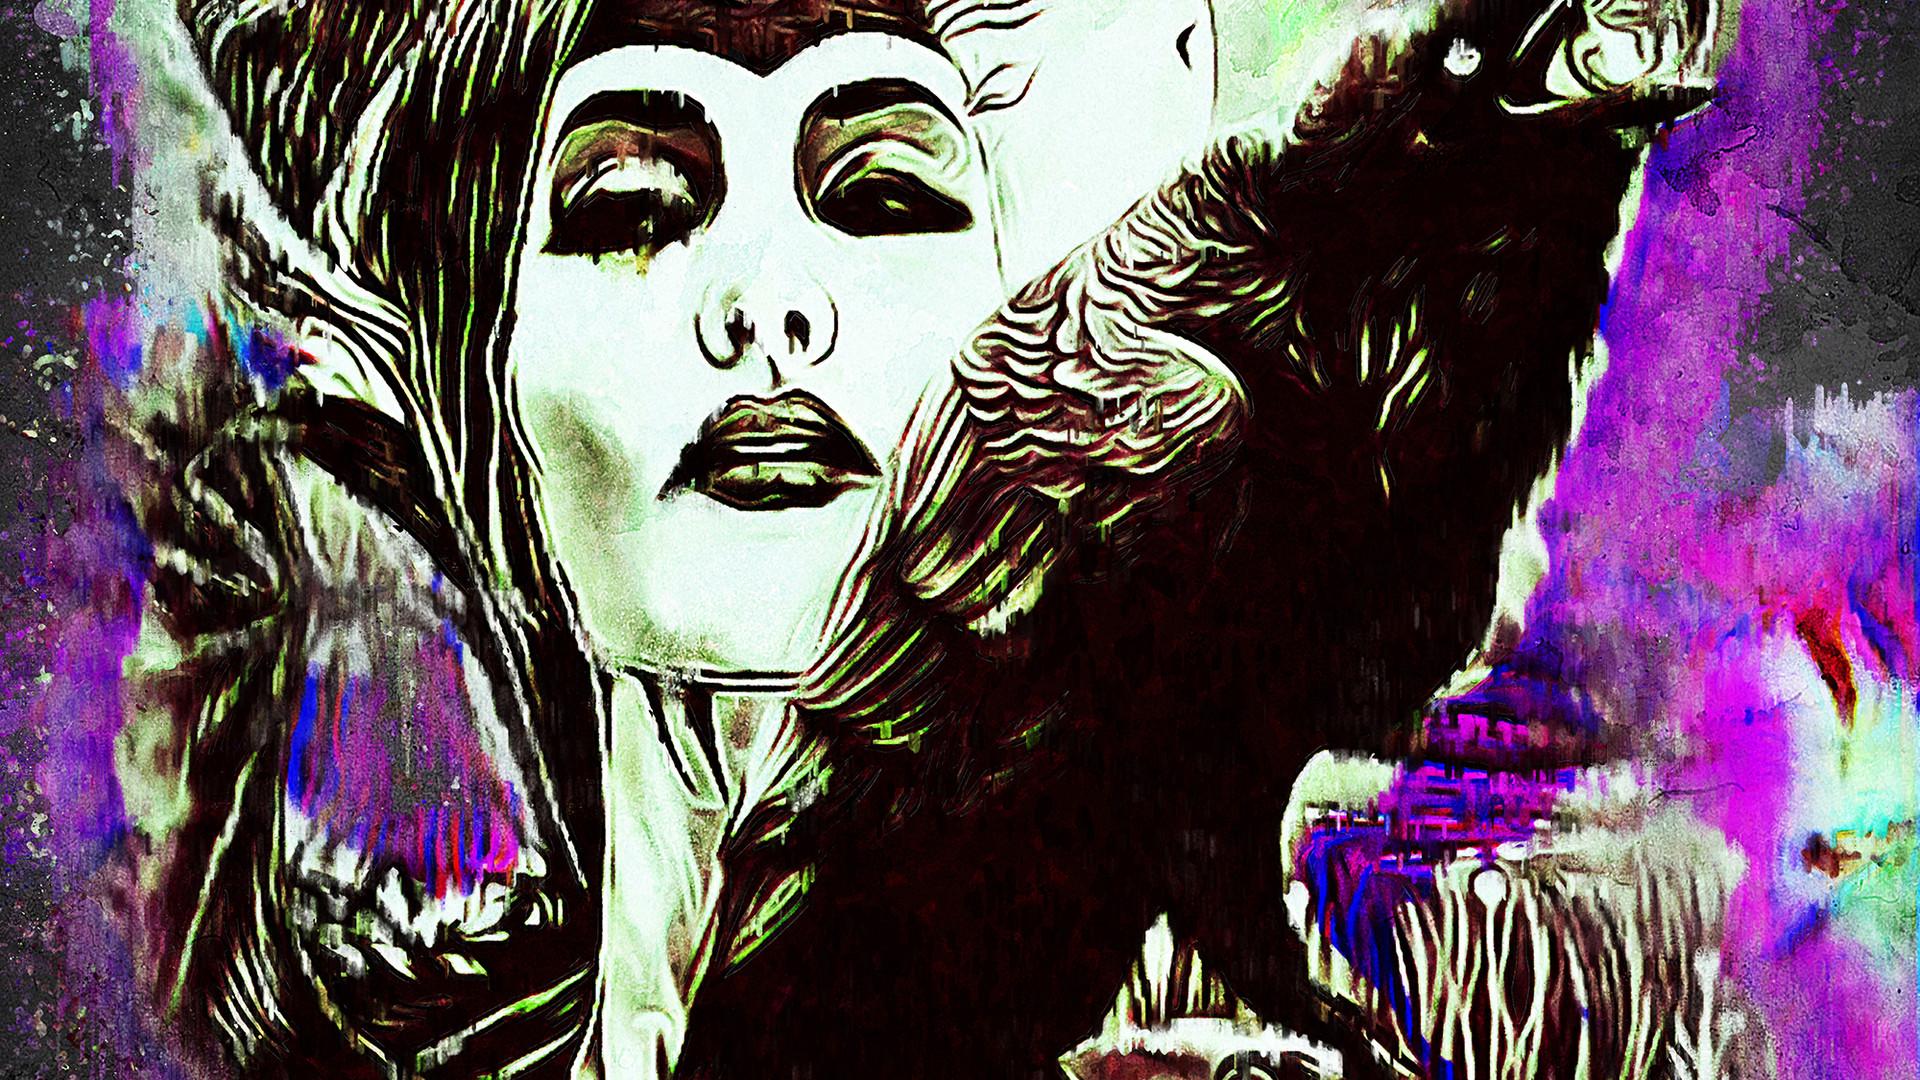 aSMALL_Maleficent_30x40.jpg